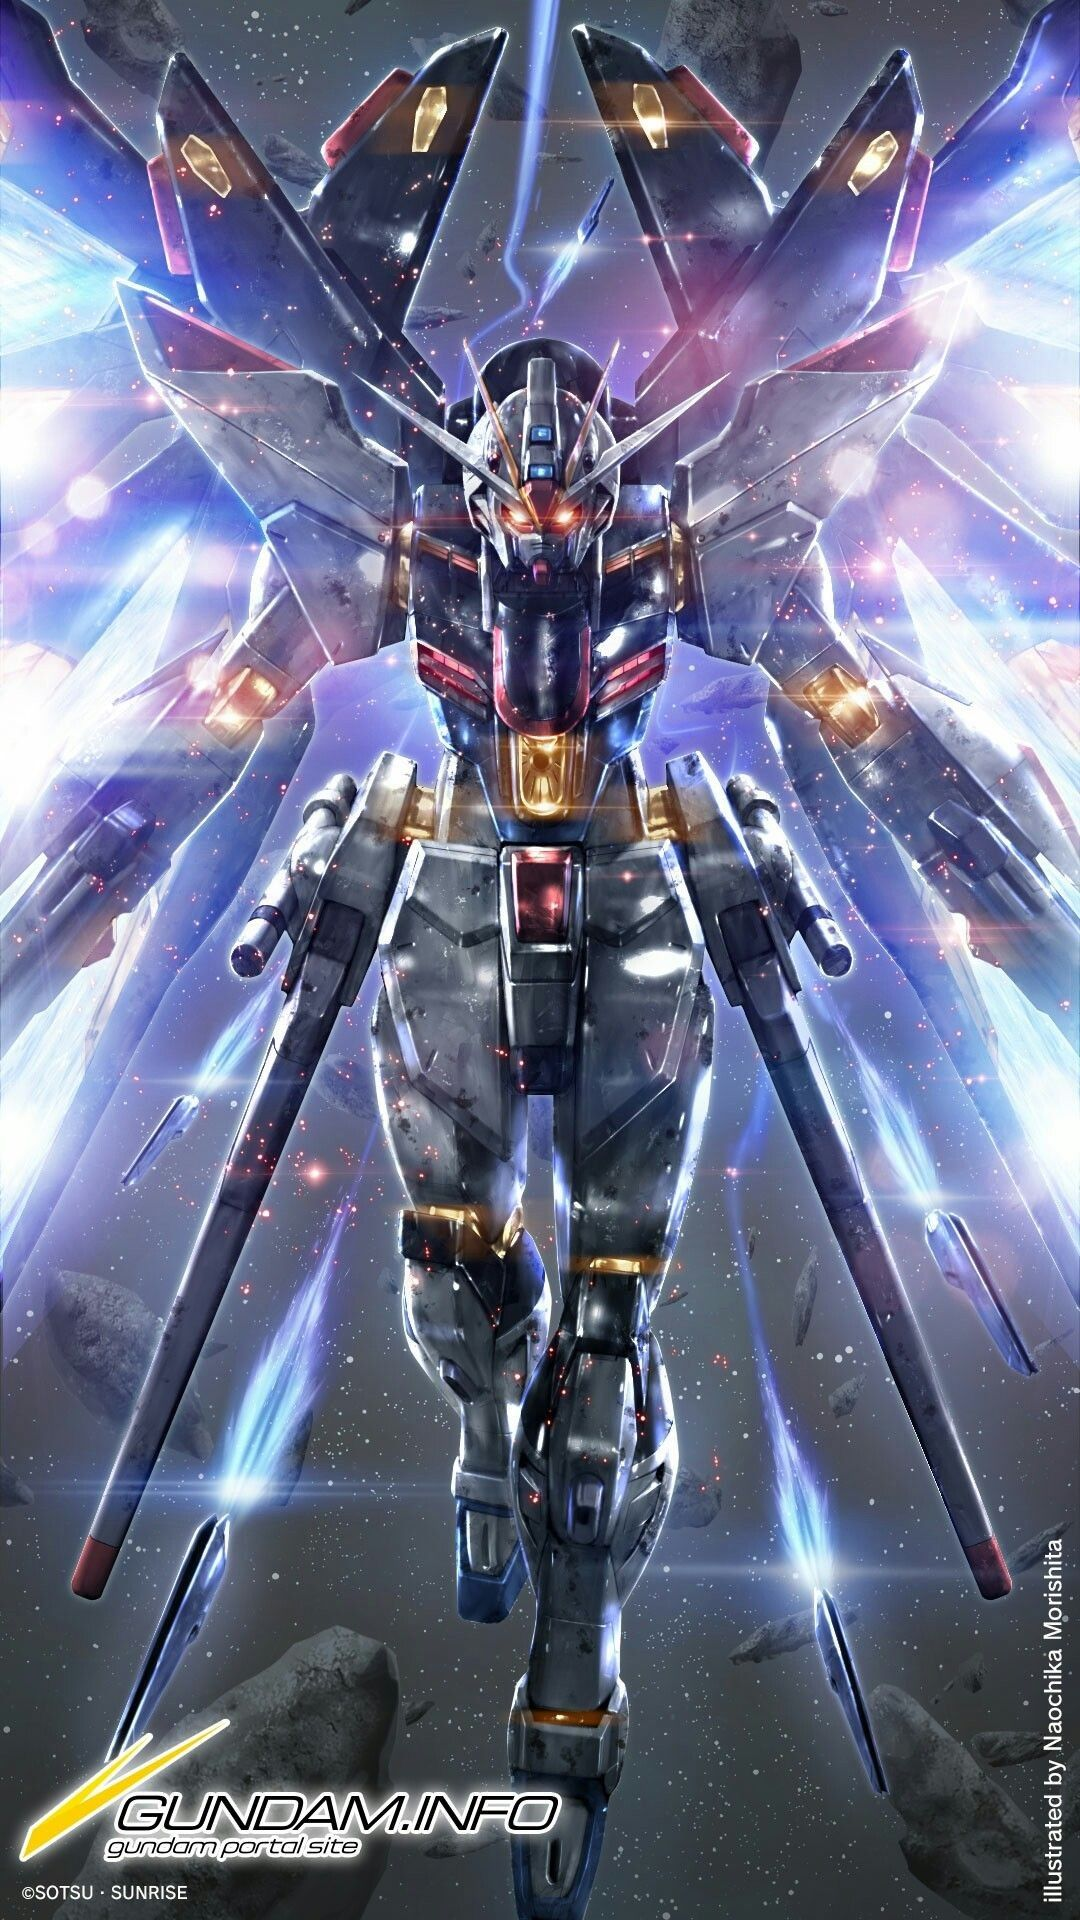 Gundam Strike Freedom Gundam Info Wallpaper Gundam Wallpapers Gundam Art Gundam